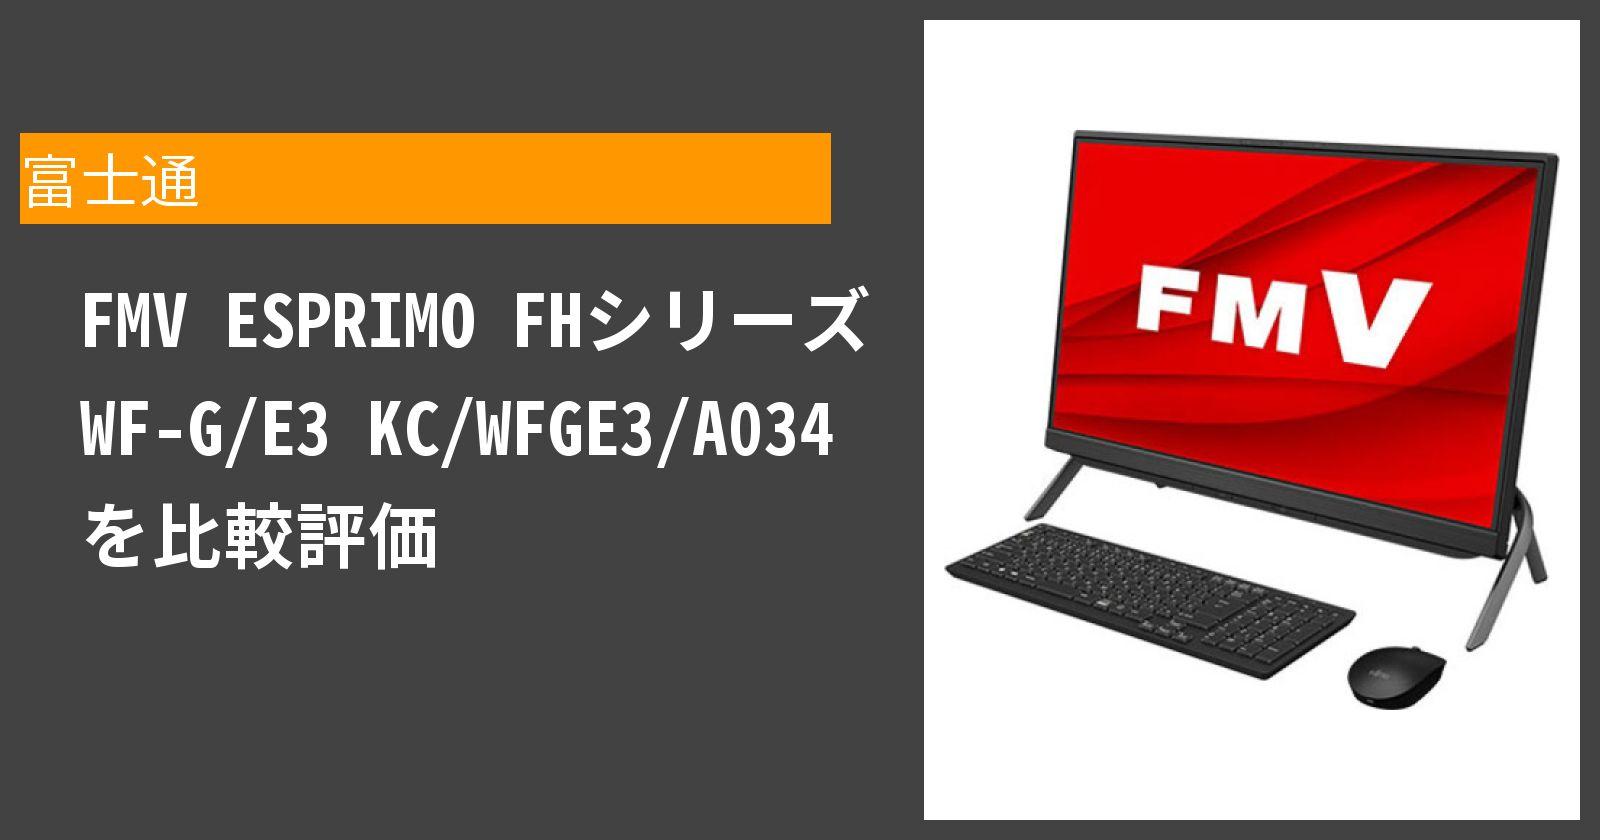 FMV ESPRIMO FHシリーズ WF-G/E3 KC/WFGE3/A034を徹底評価